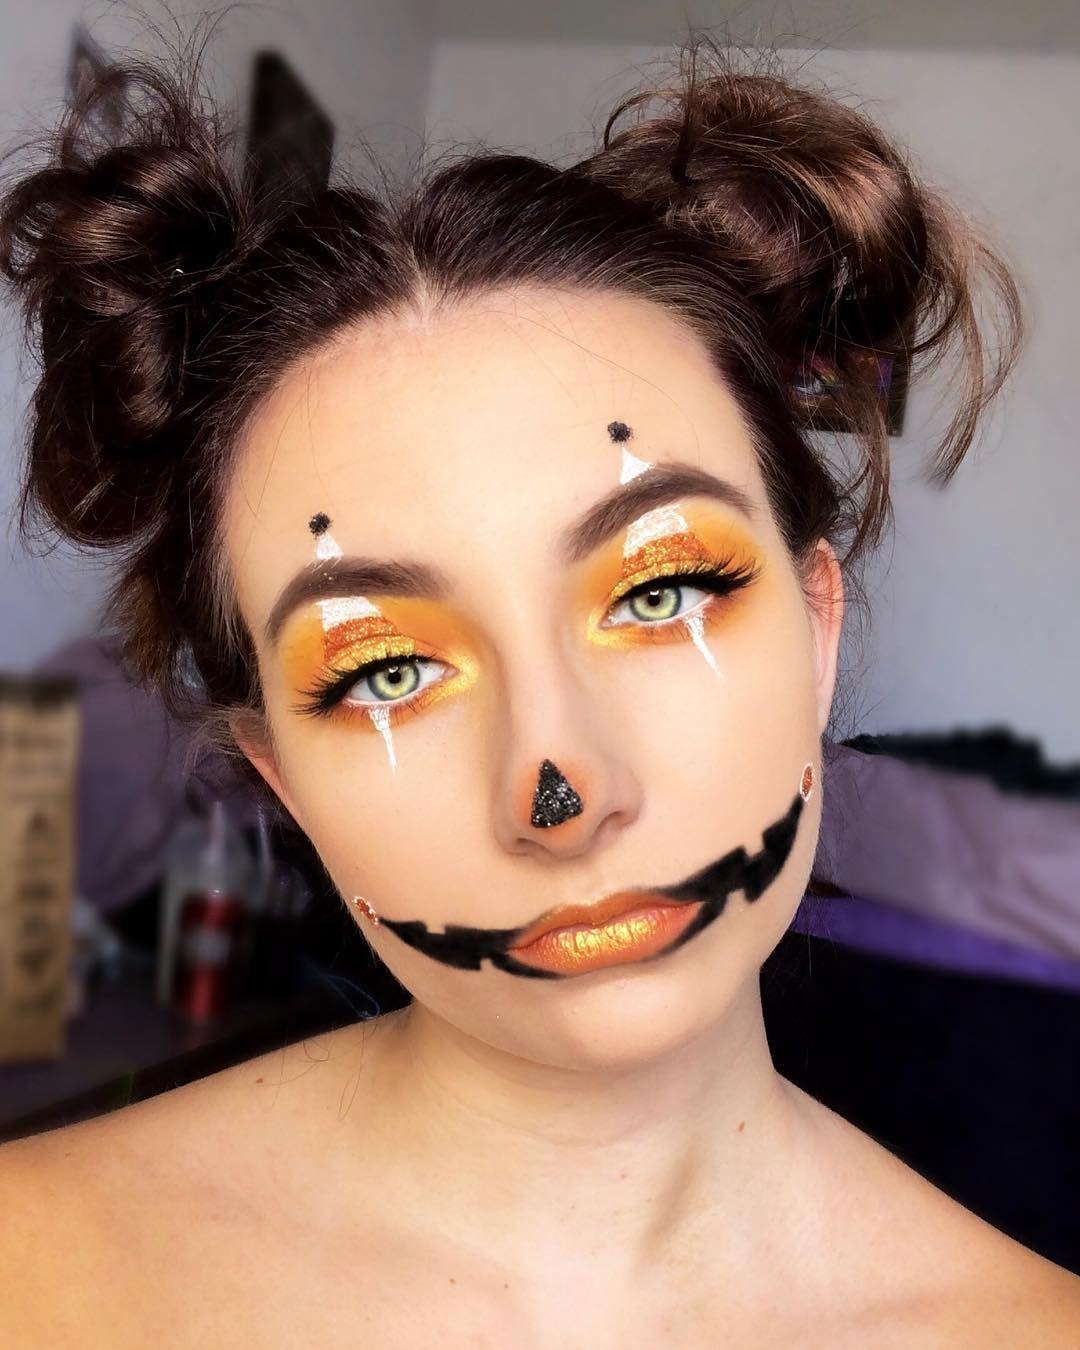 Candy corn face las vegas makeup artist check out